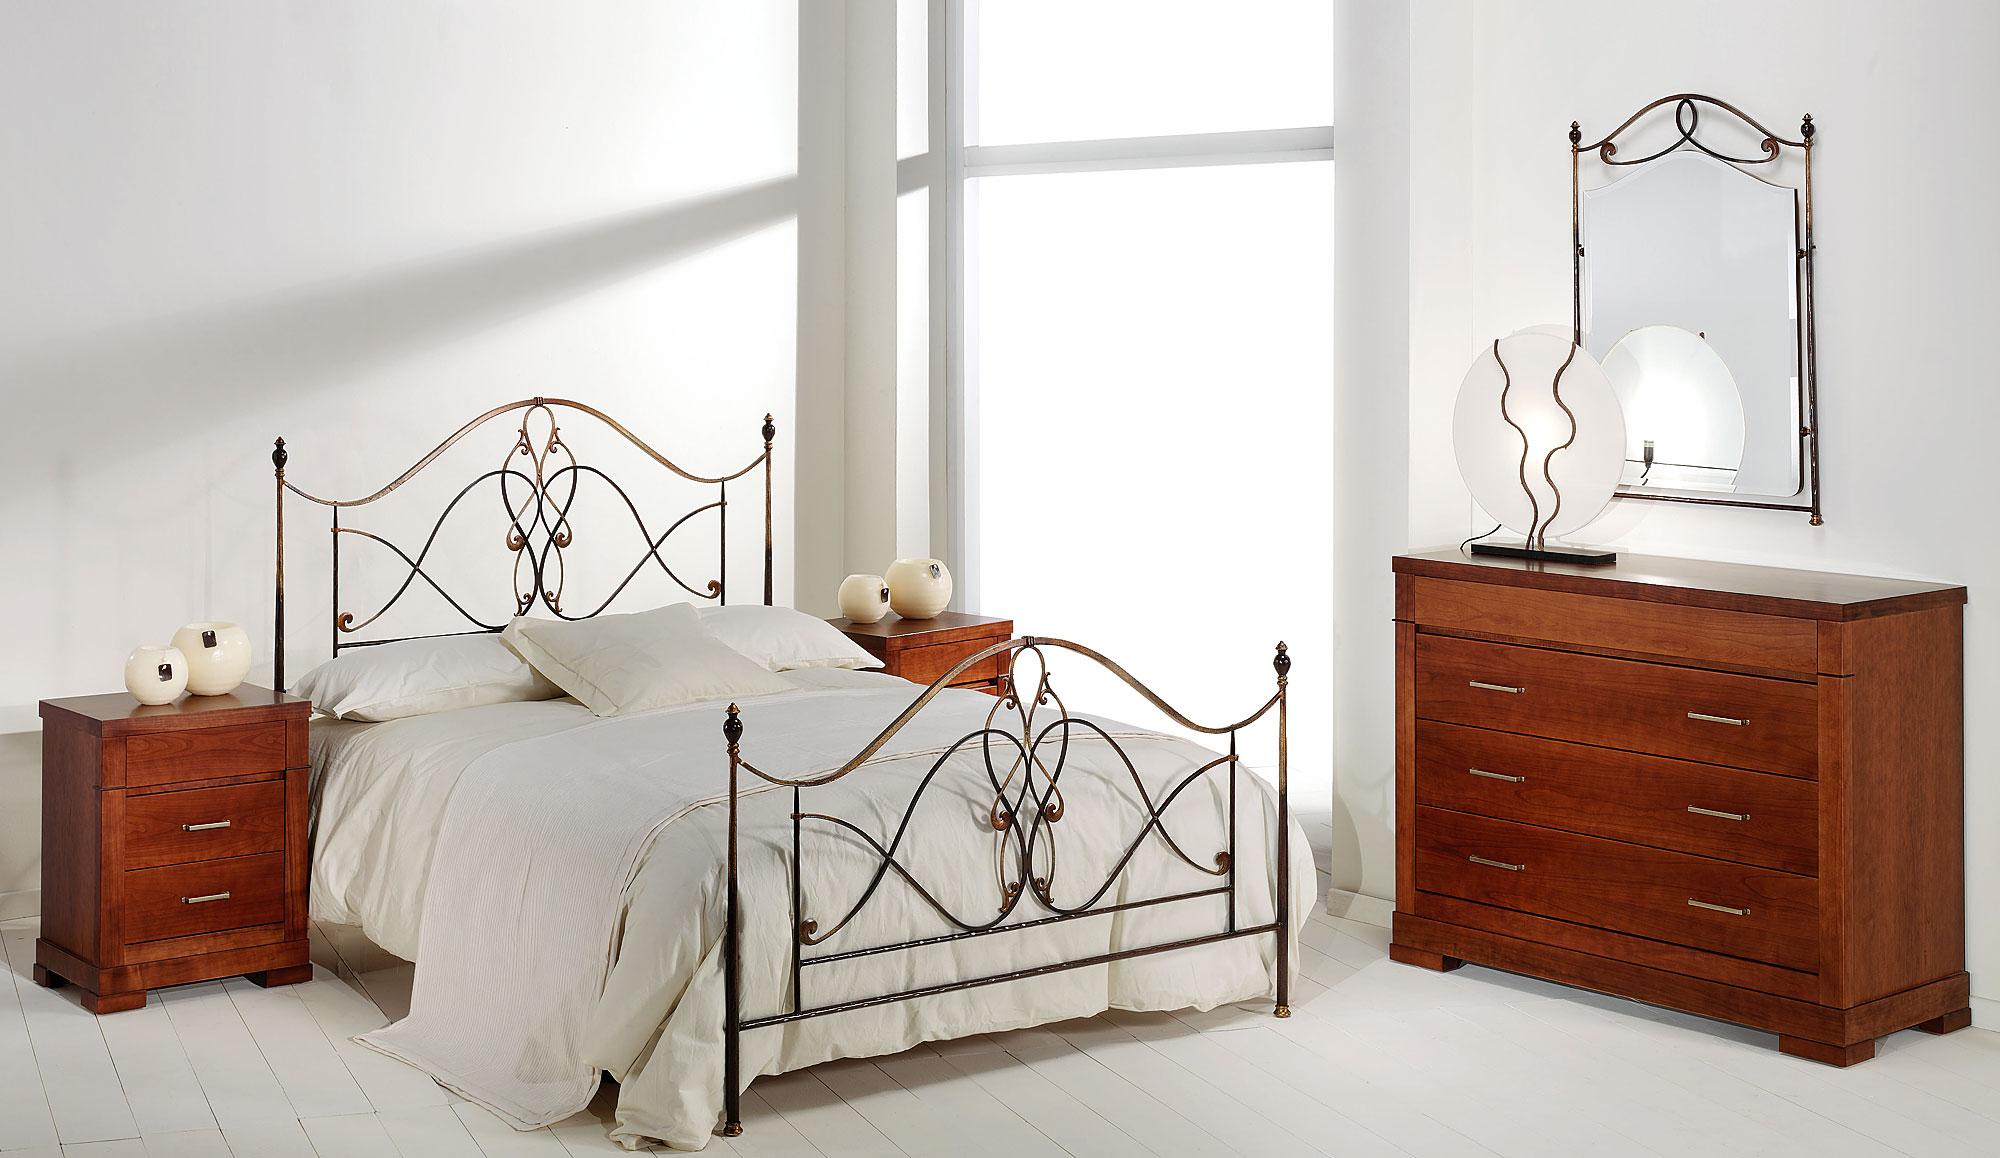 Dormitorio forja floria en - Muebles en forja ...